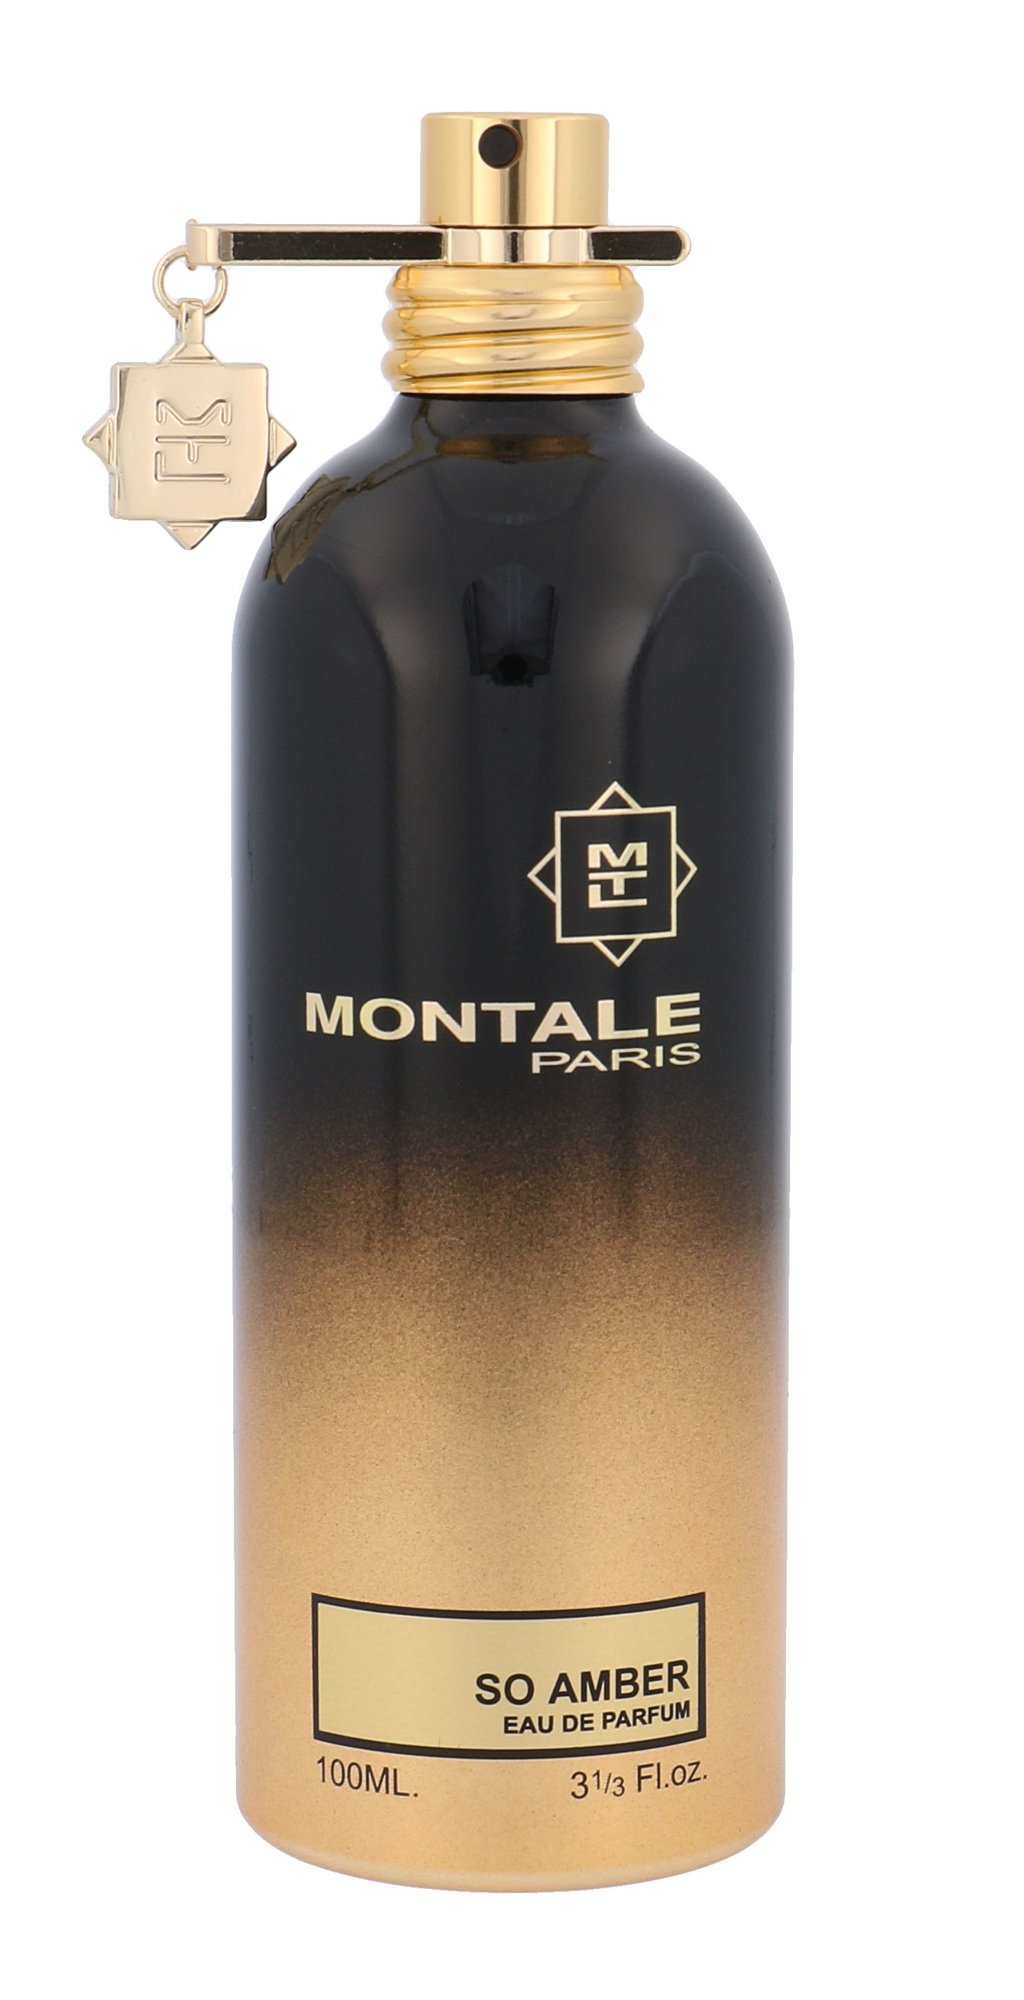 Montale Paris So Amber EDP 100ml